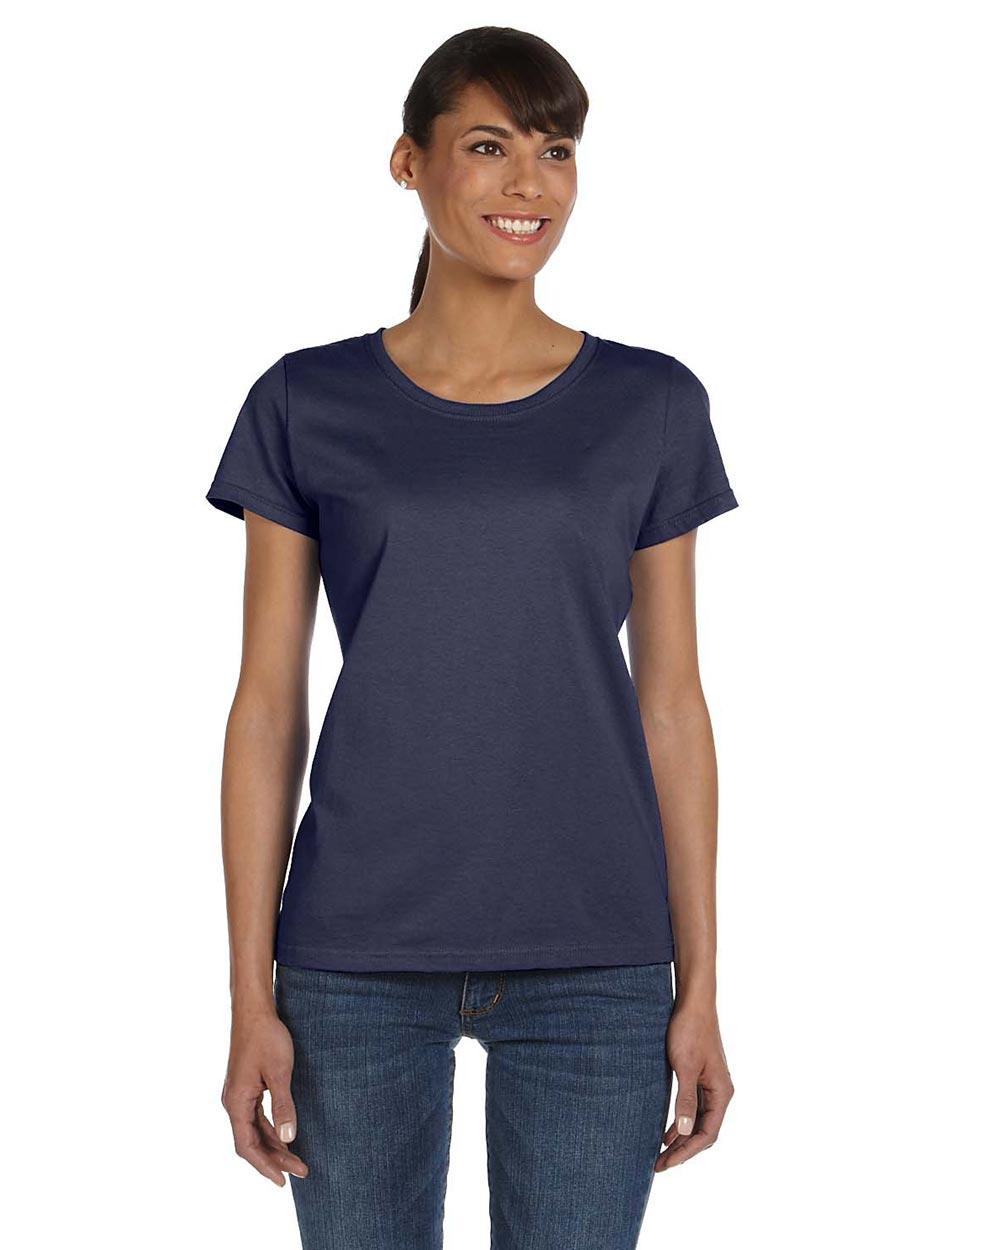 Fruit Of The Loom L3930R - Ladies' 8.3 oz HD Cotton T-Shirt